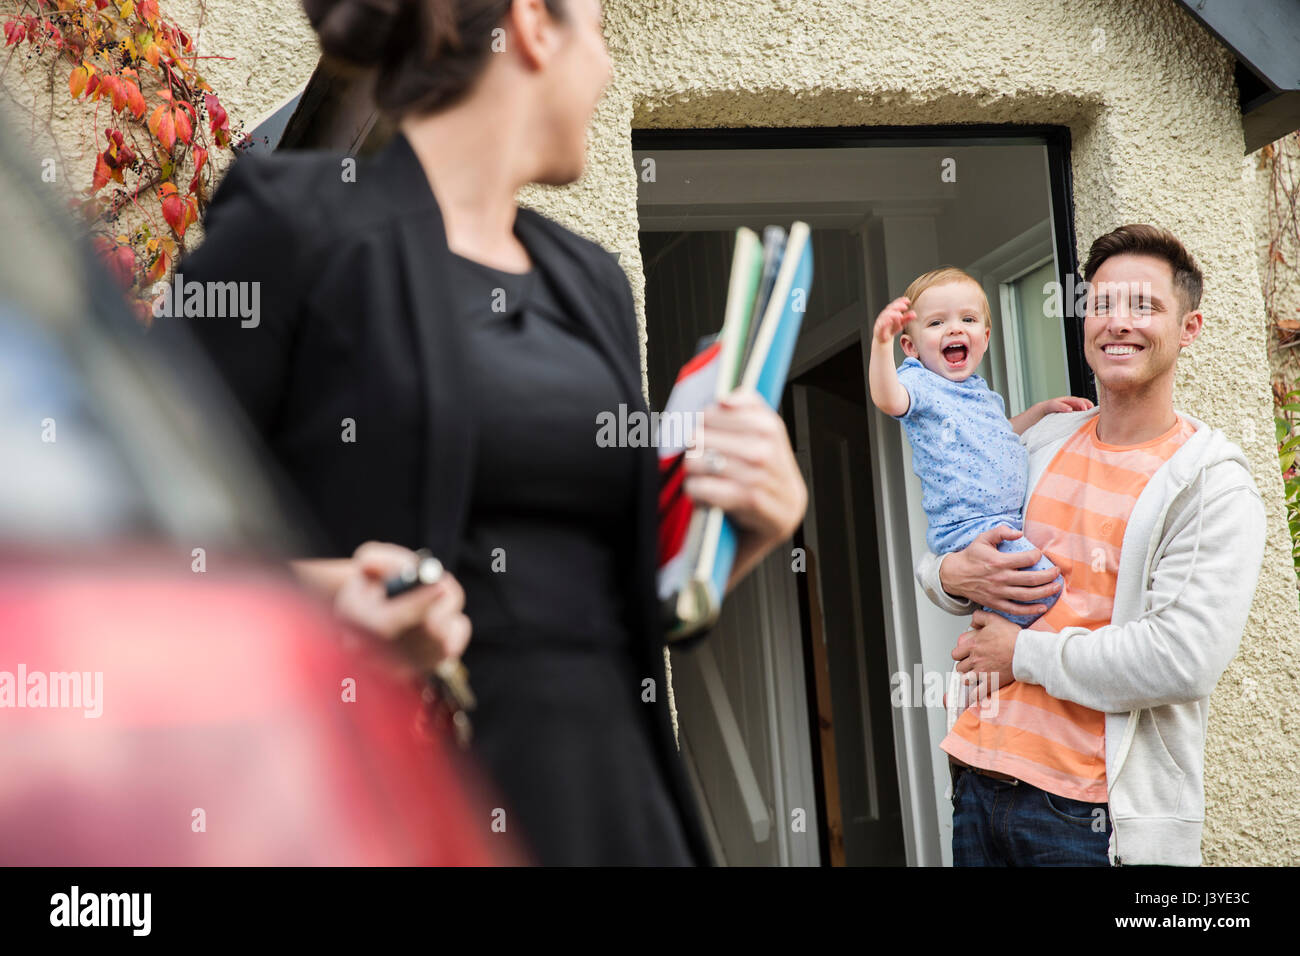 Vater und Kind Sohn winken Mutter an Haustür zu Hause Stockbild